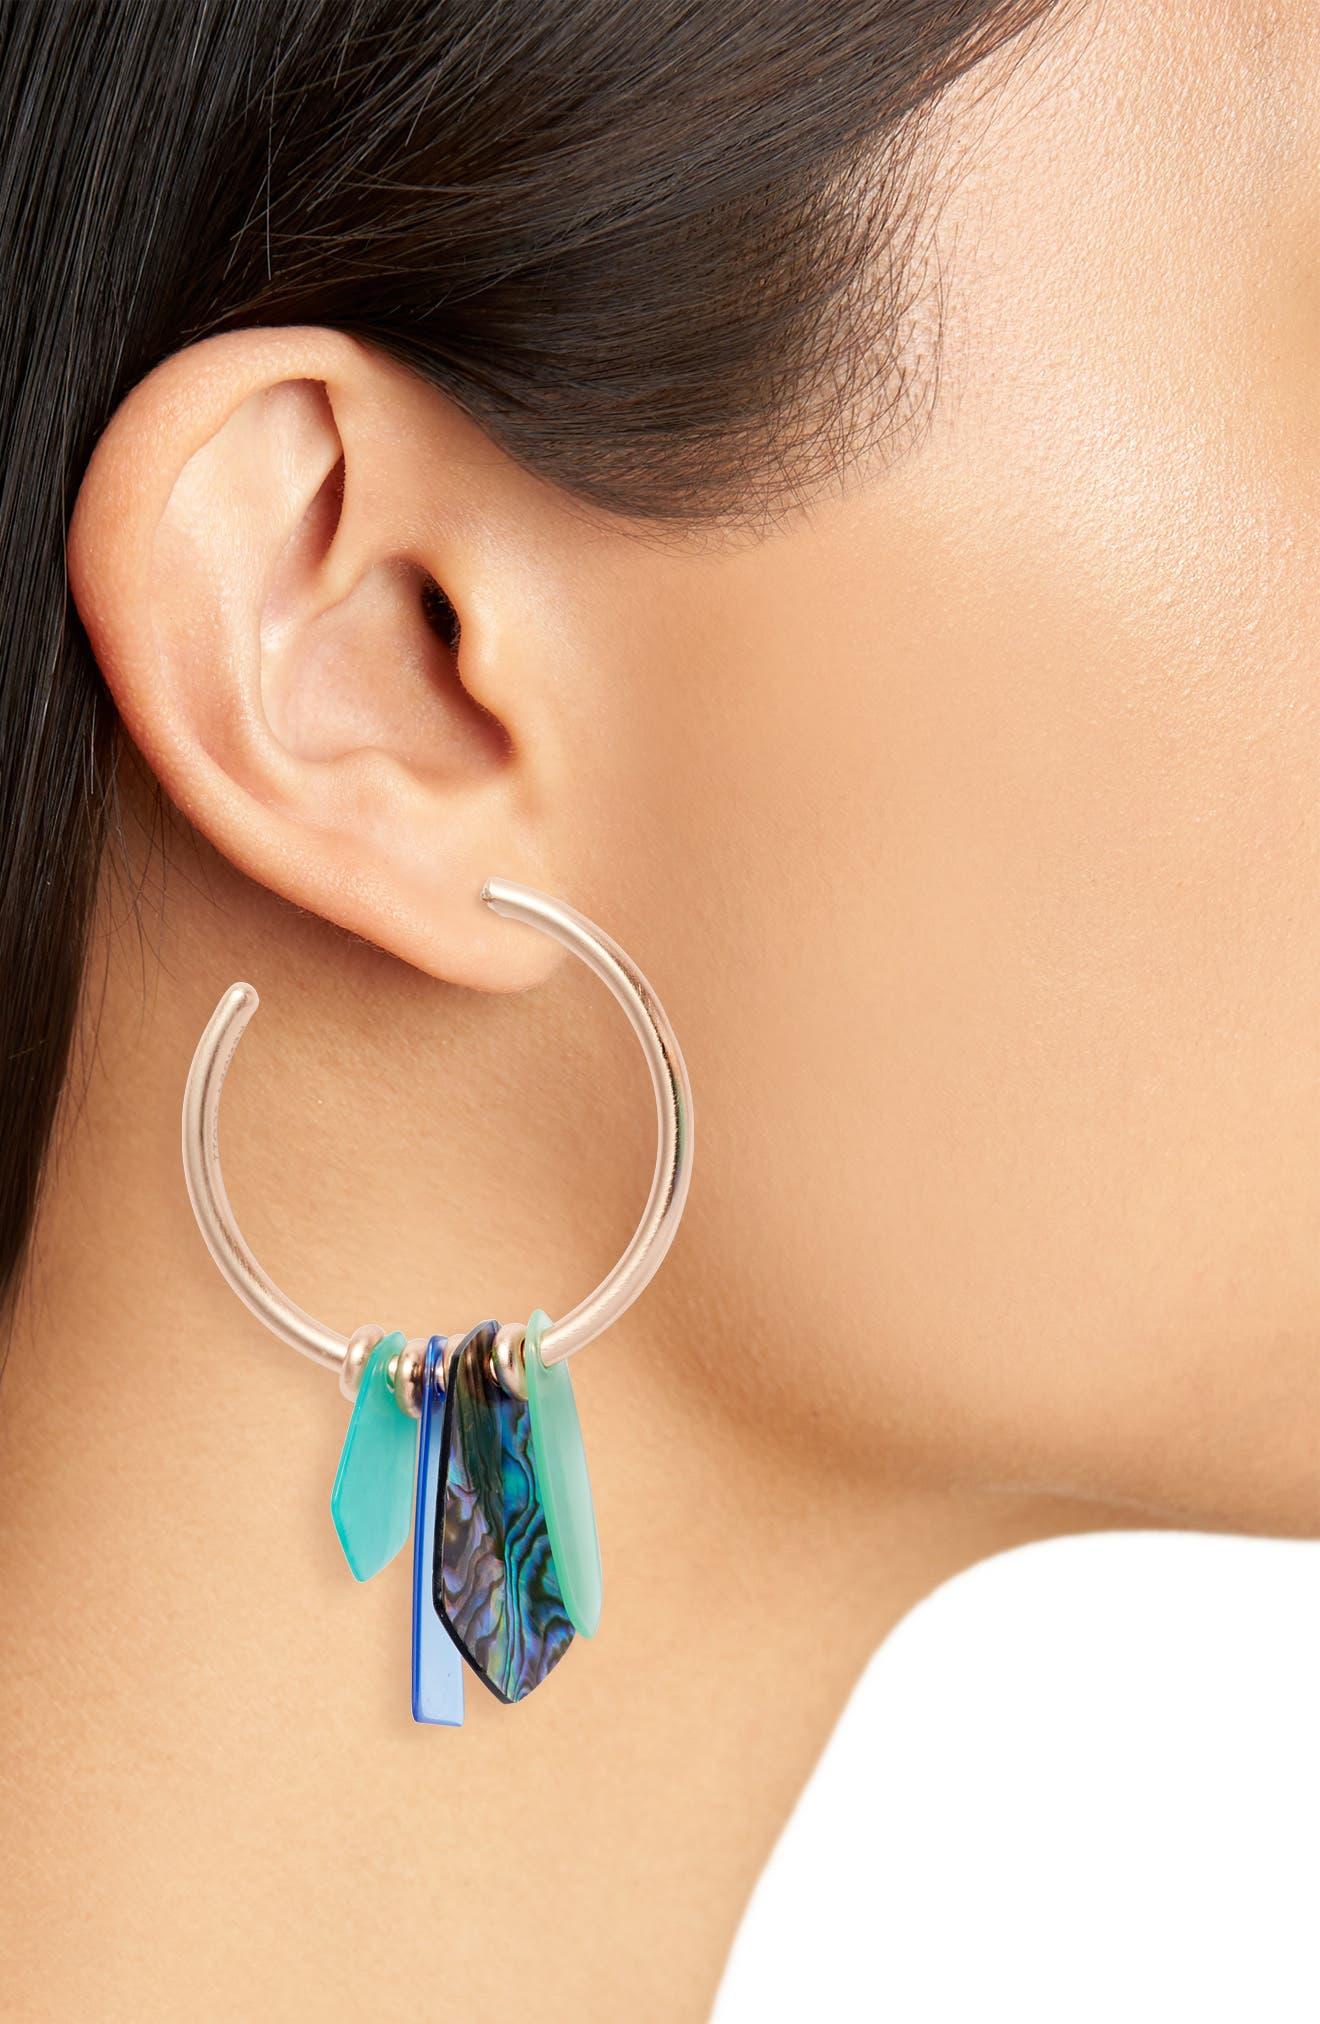 KENDRA SCOTT, Gaby Hoop Earrings, Alternate thumbnail 2, color, ABALONE MIX/ ROSE GOLD